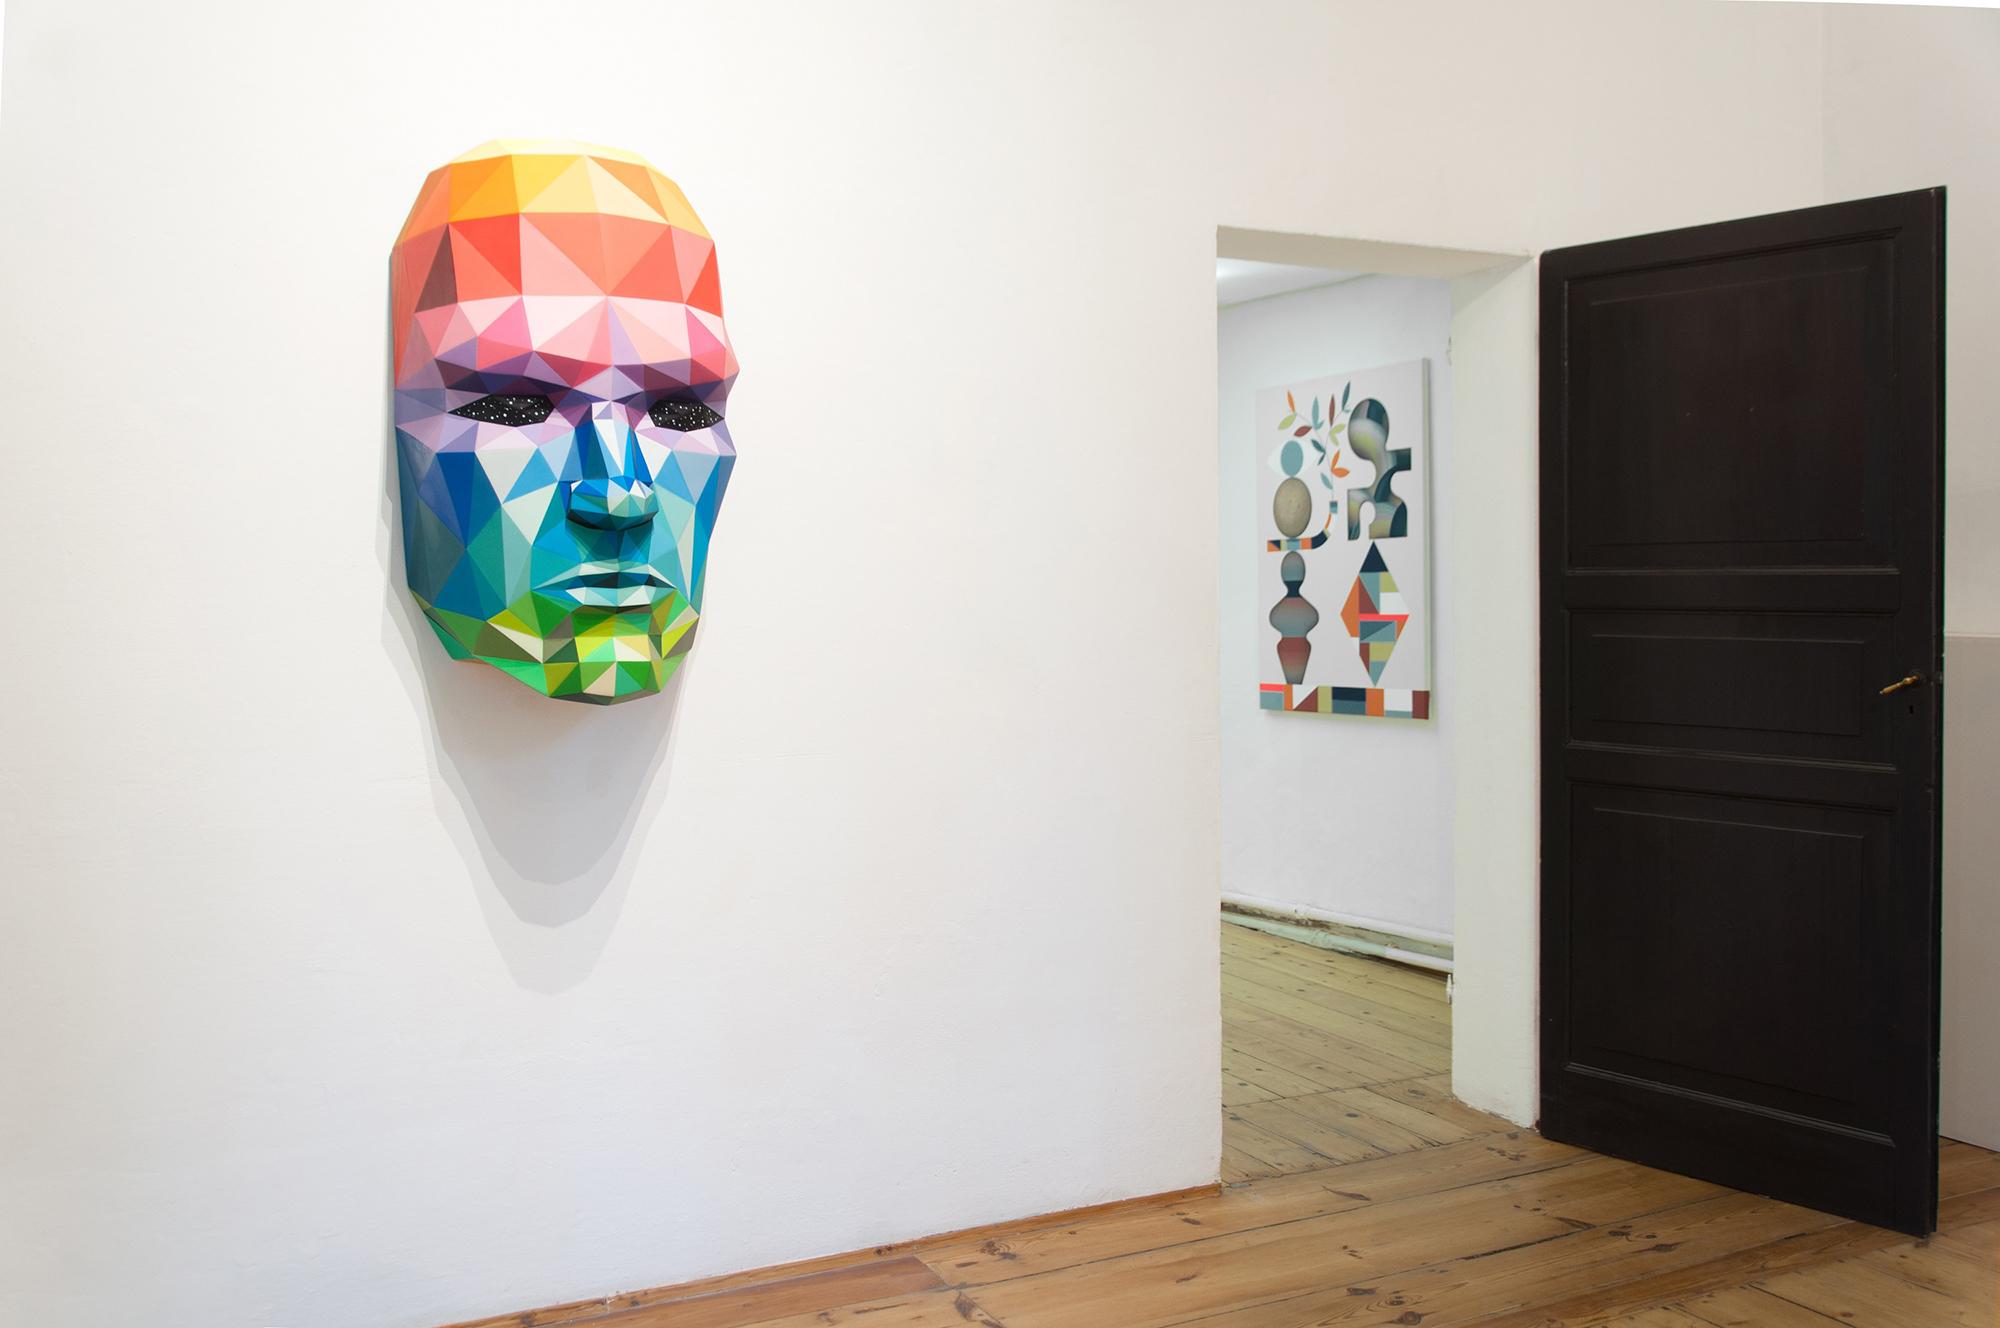 Surreal Irreverence: Hell'O Okuda Zebu Magma Gallery